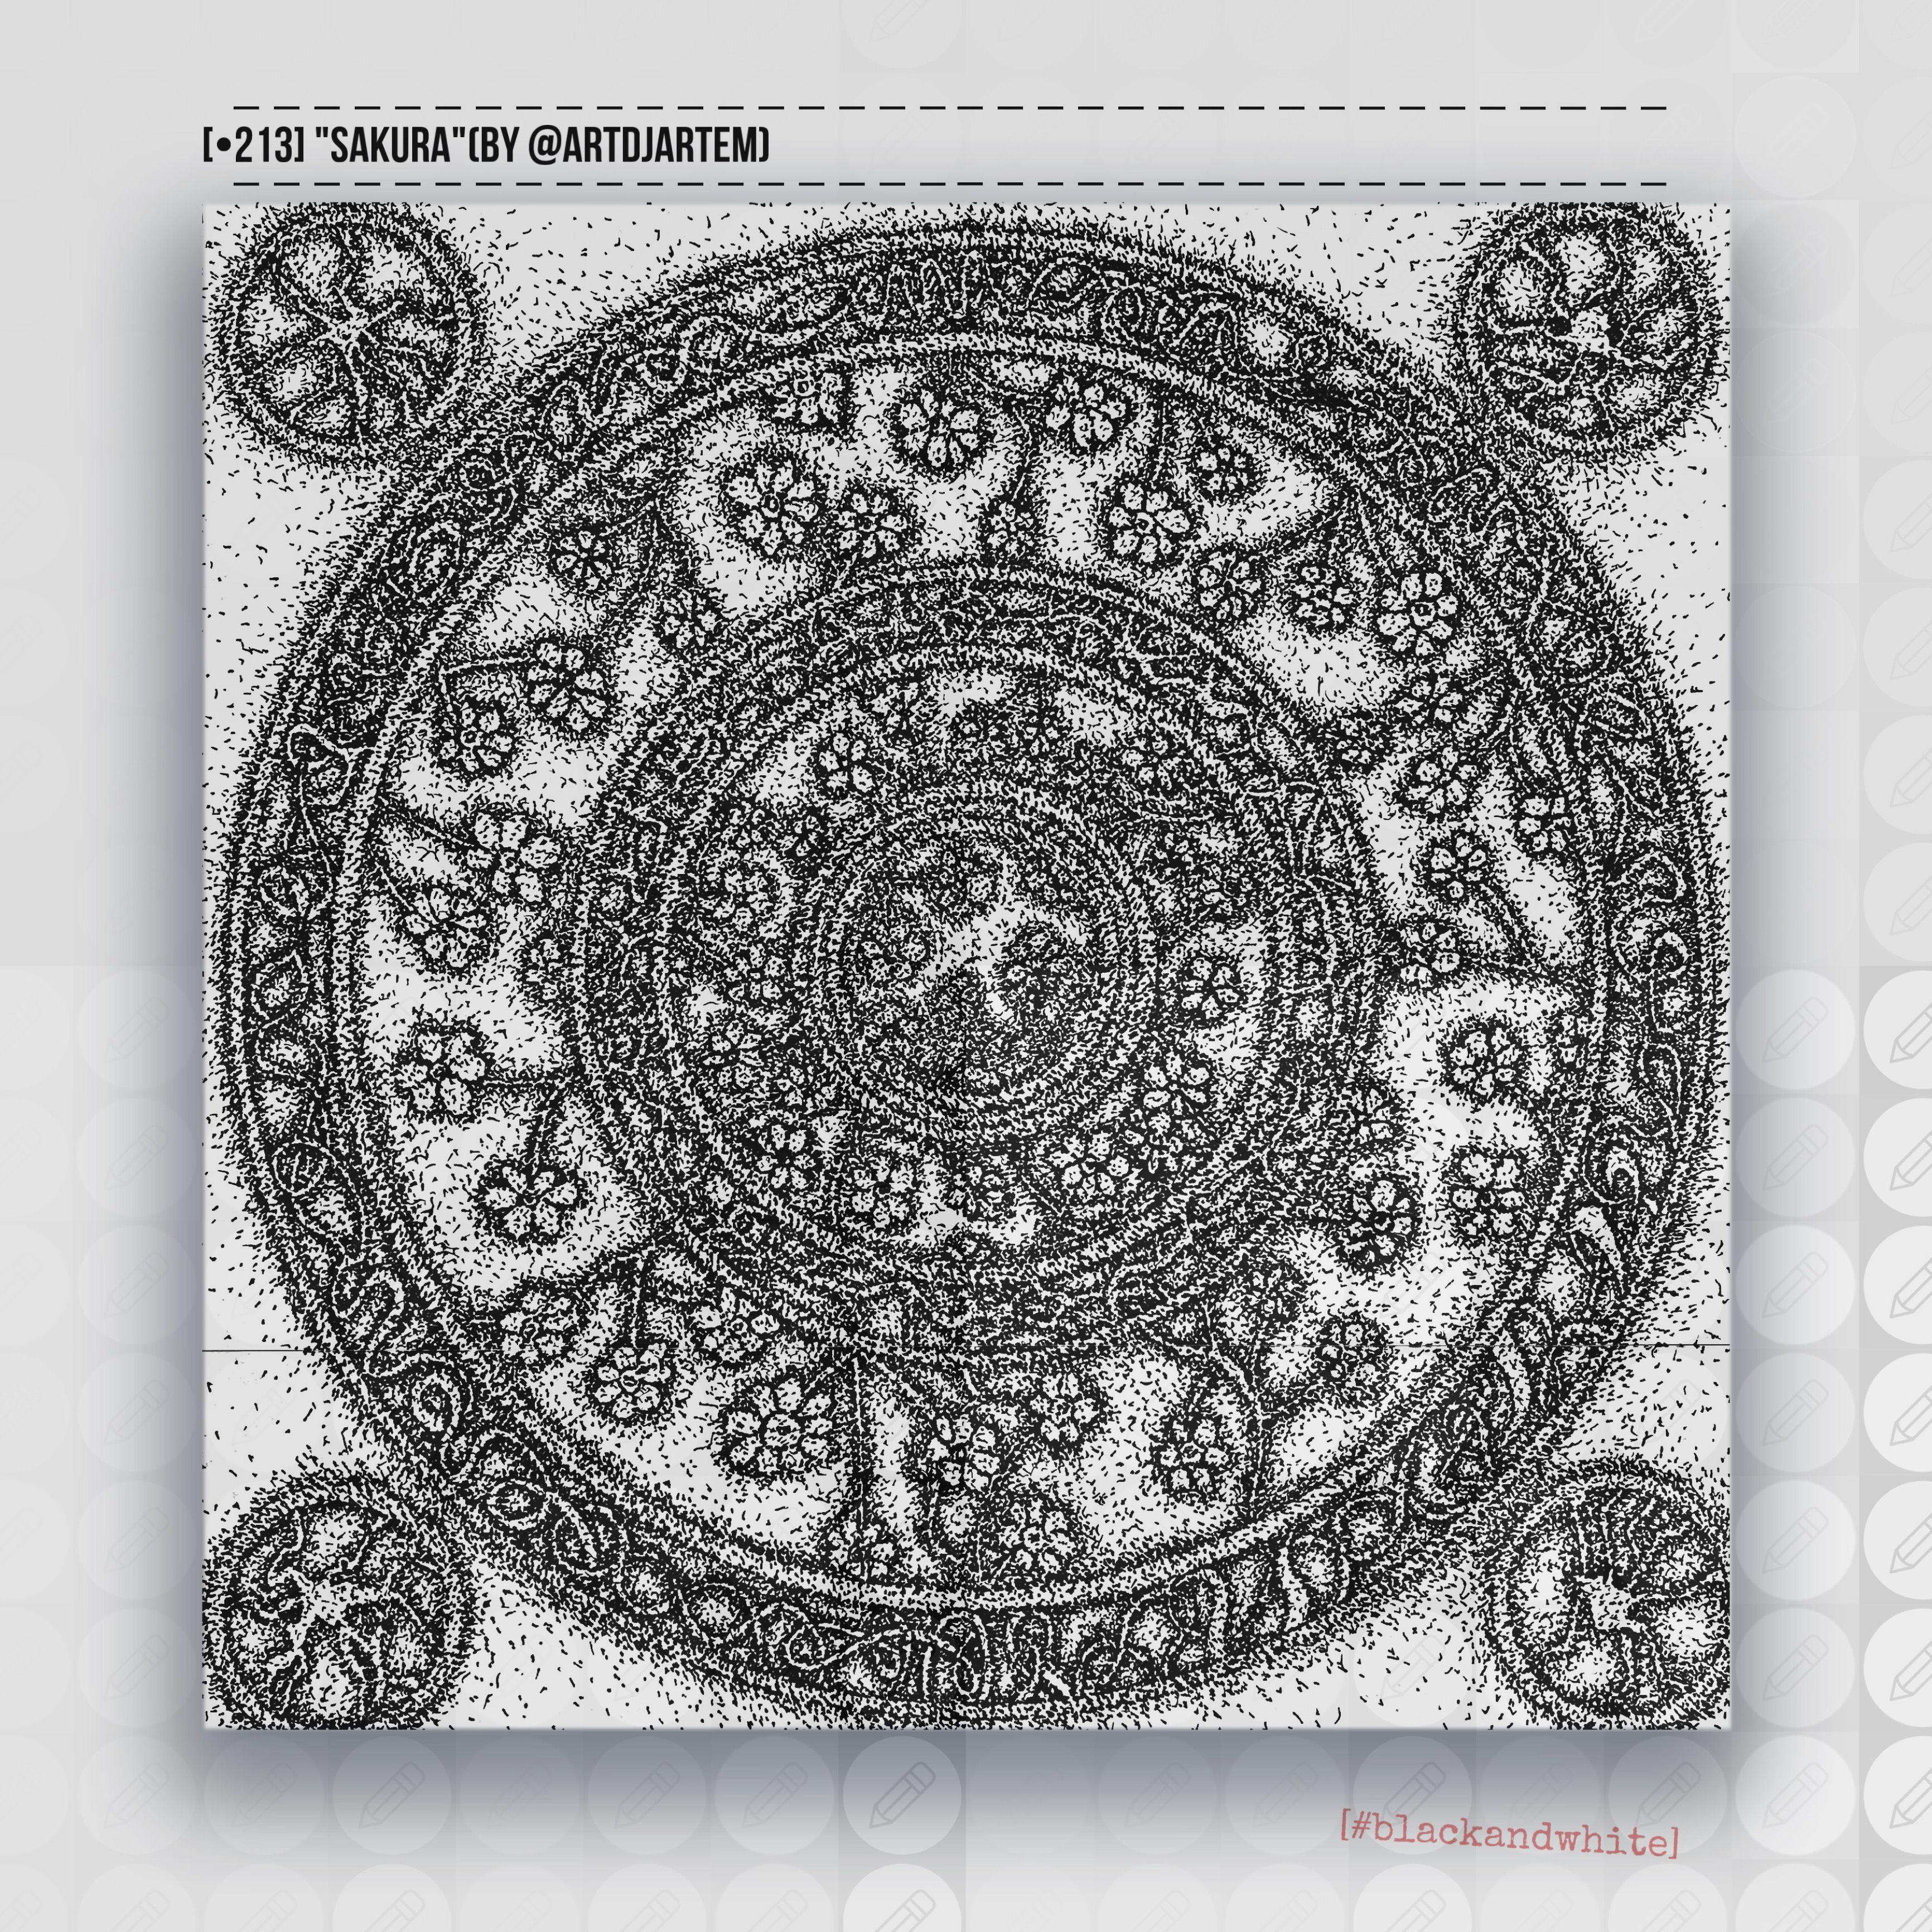 #sakura #blackandwhite #black #goodday #art #loveart #arts #illustration #blackart #moreart #artdjartem #abstractart #new #monday #iloveart #stayhome #likethis #spb #искусство #арт